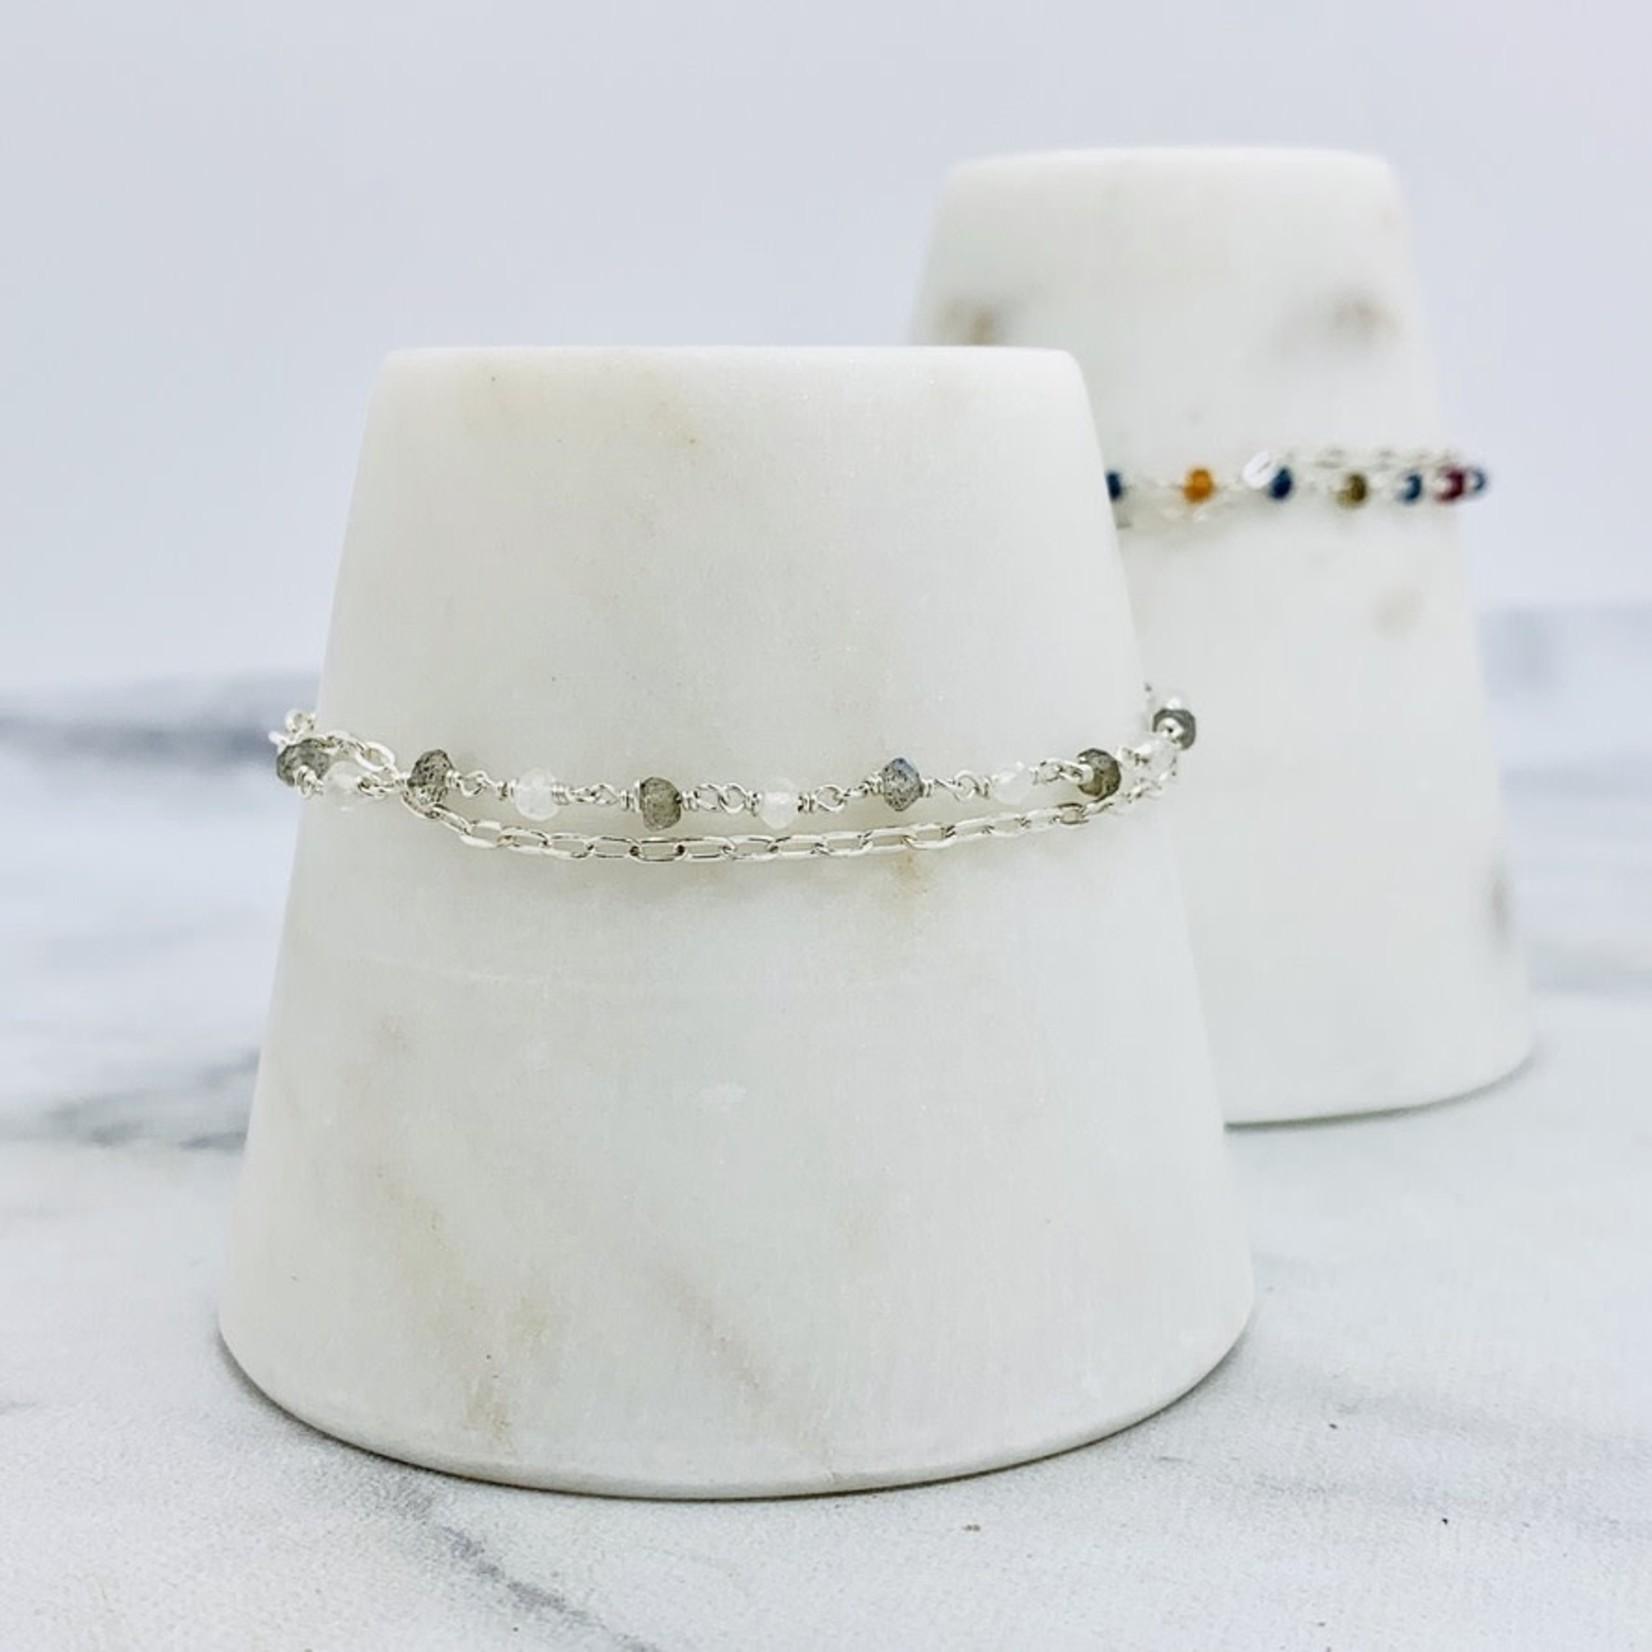 EVANKNOX Handmade Bracelet with connected labradorite, rainbow moonstone, 1/2 double